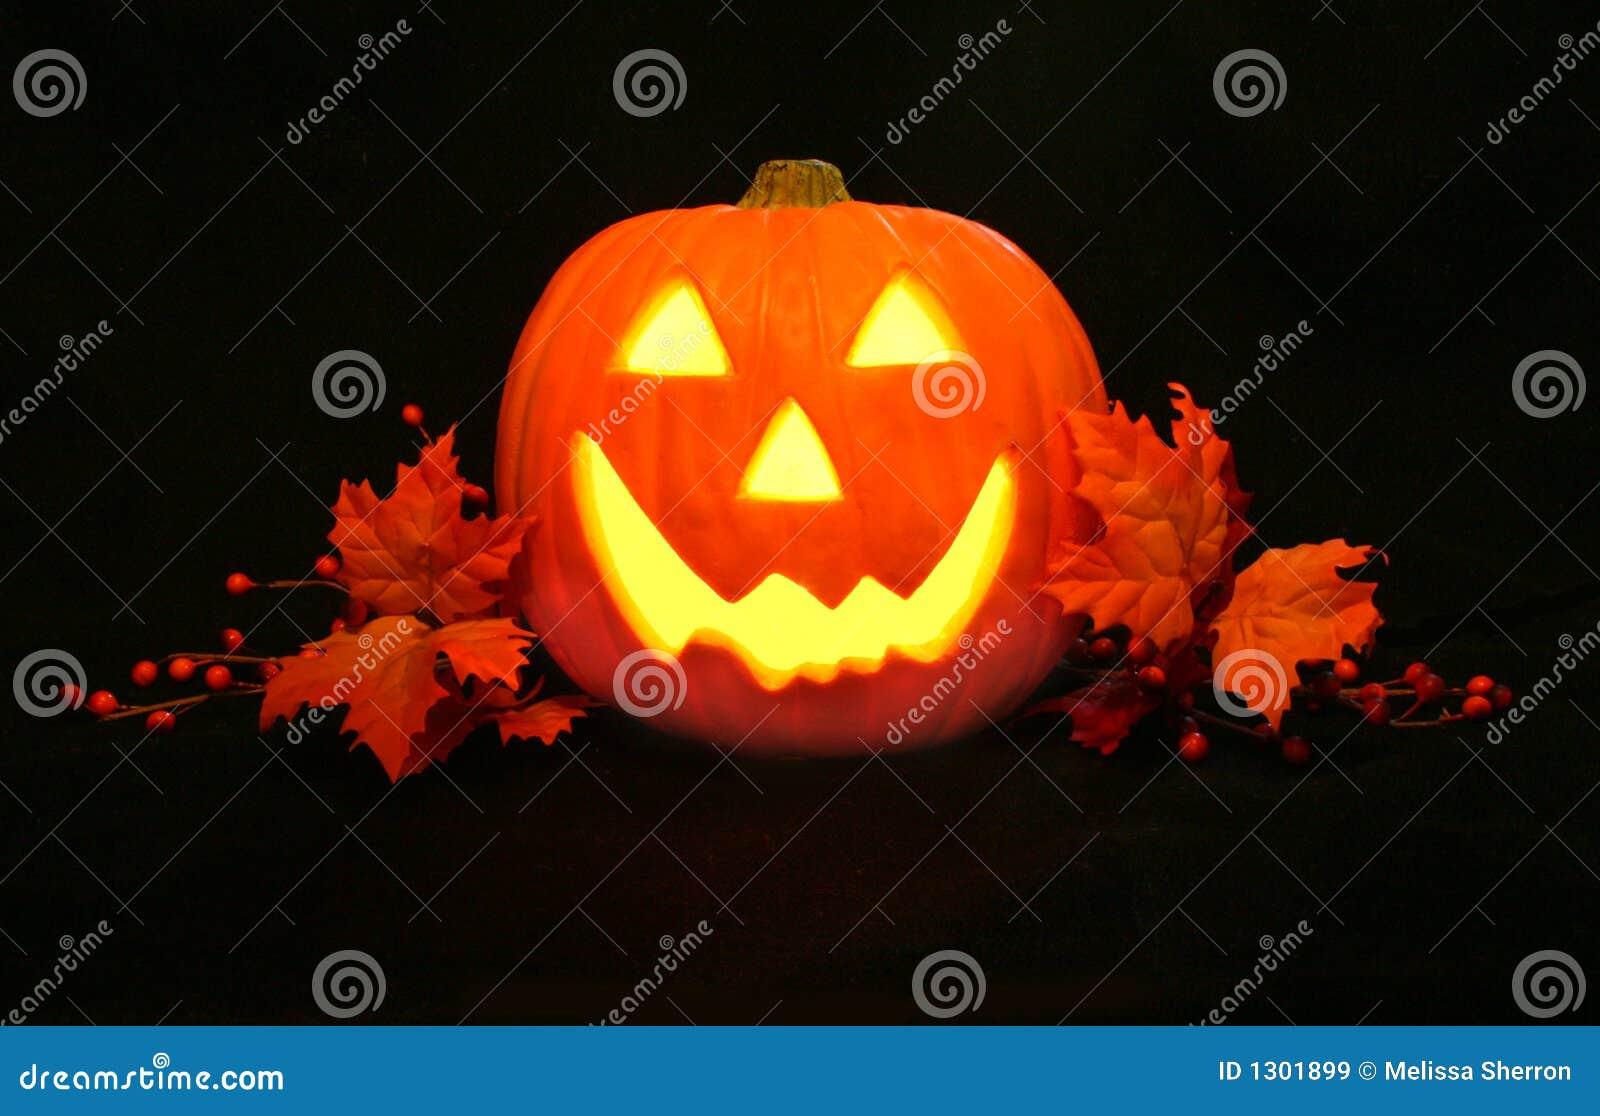 Happy Jack O Lantern Face Stock Image Image Of Pumpkin 1301899